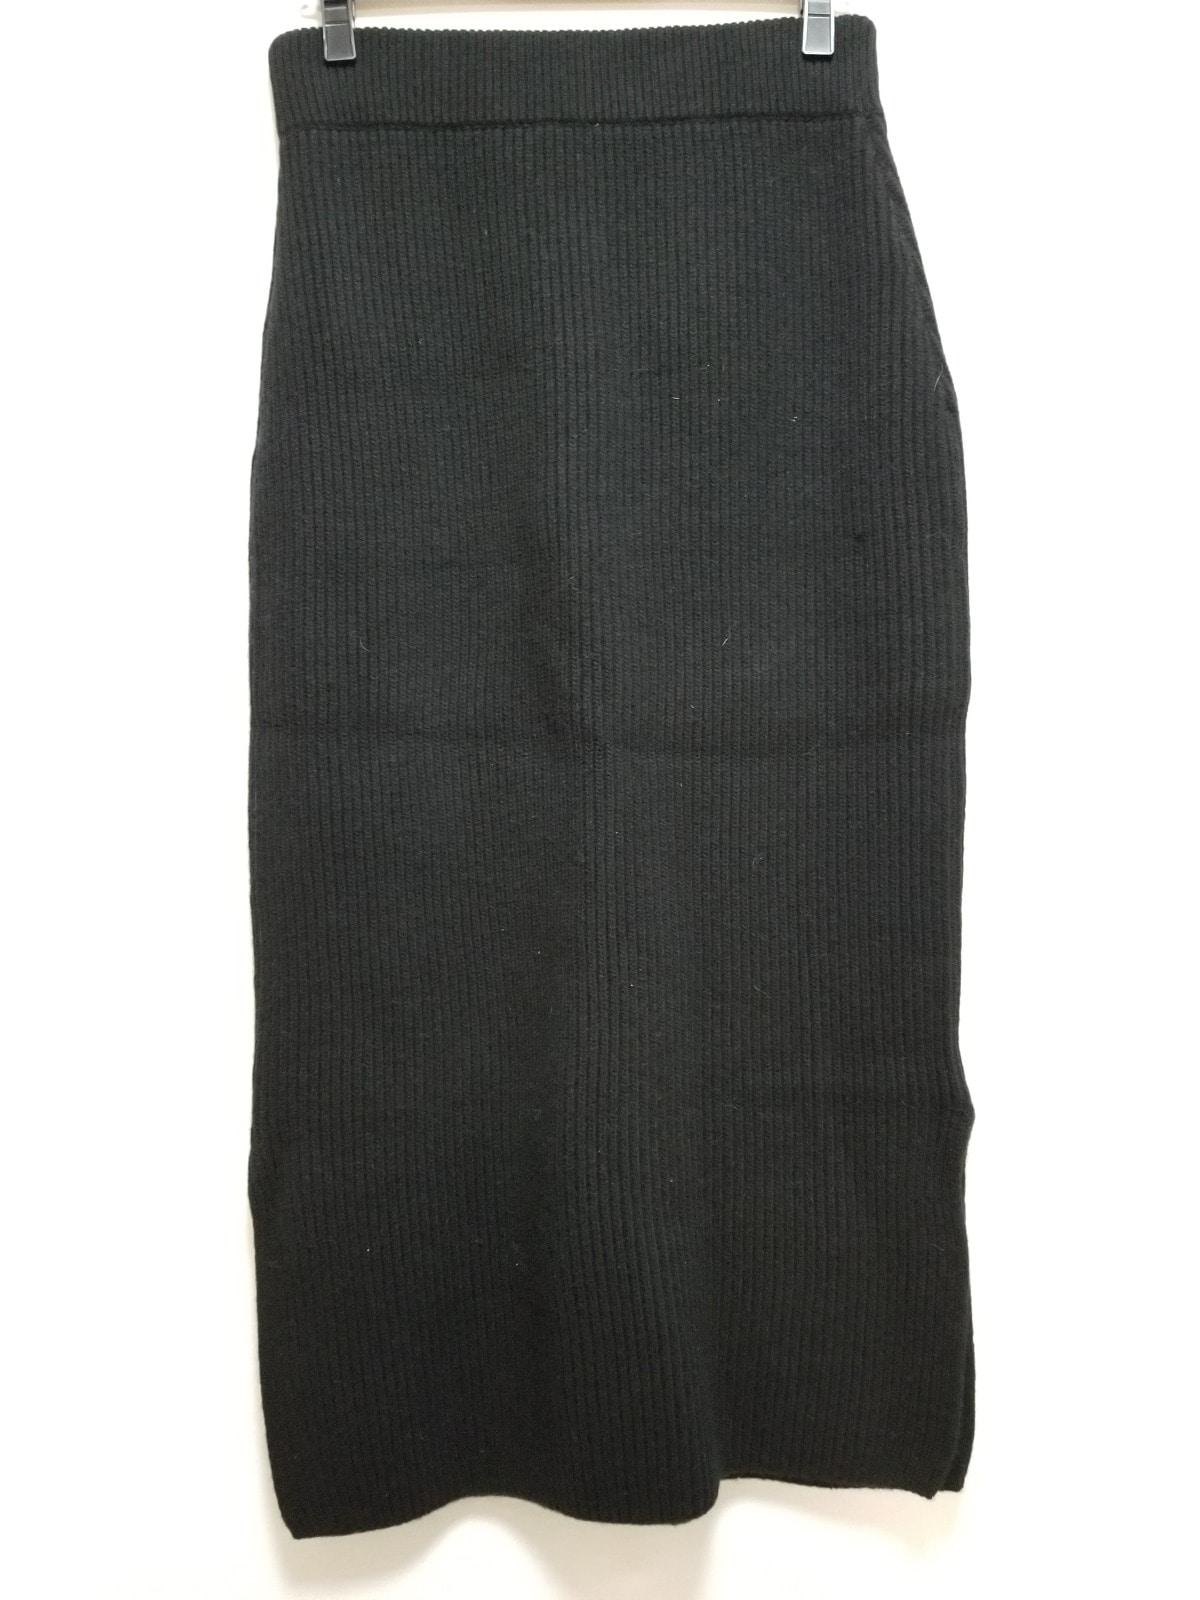 nagonstans(ナゴンスタンス)のスカート